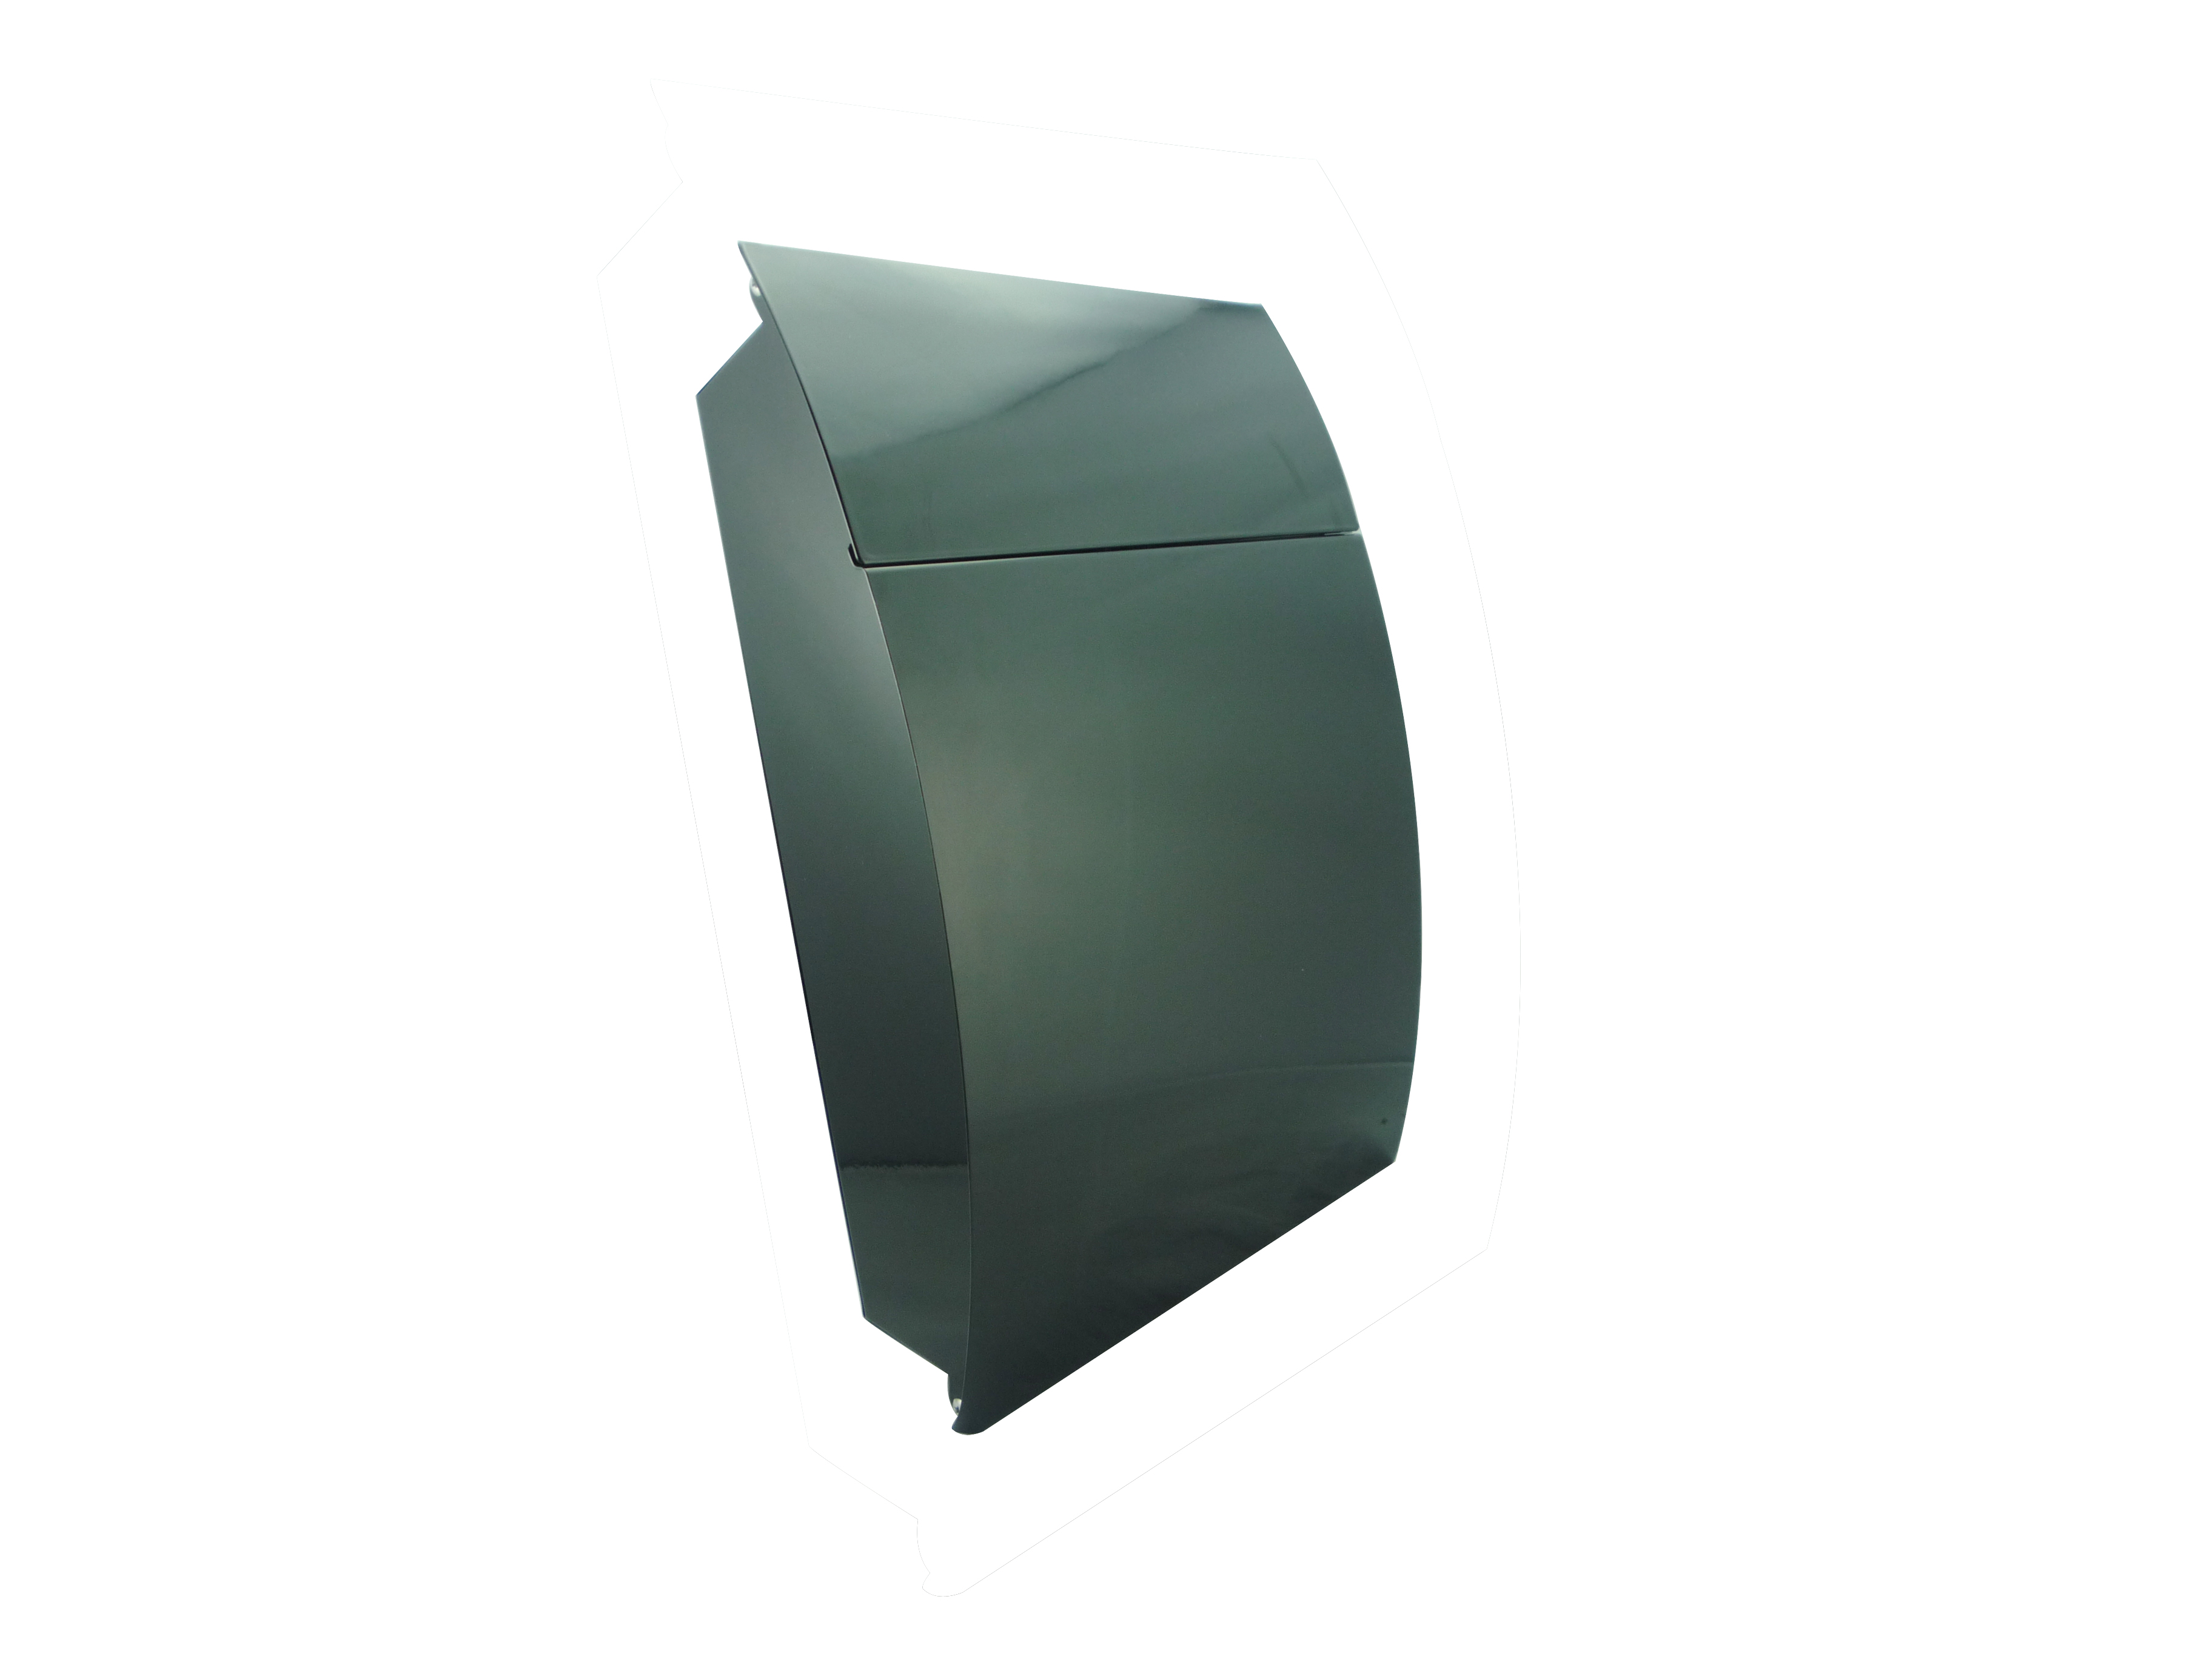 Morden Small Capacity Galvanized Steel Wall-Mount Mailbox Black